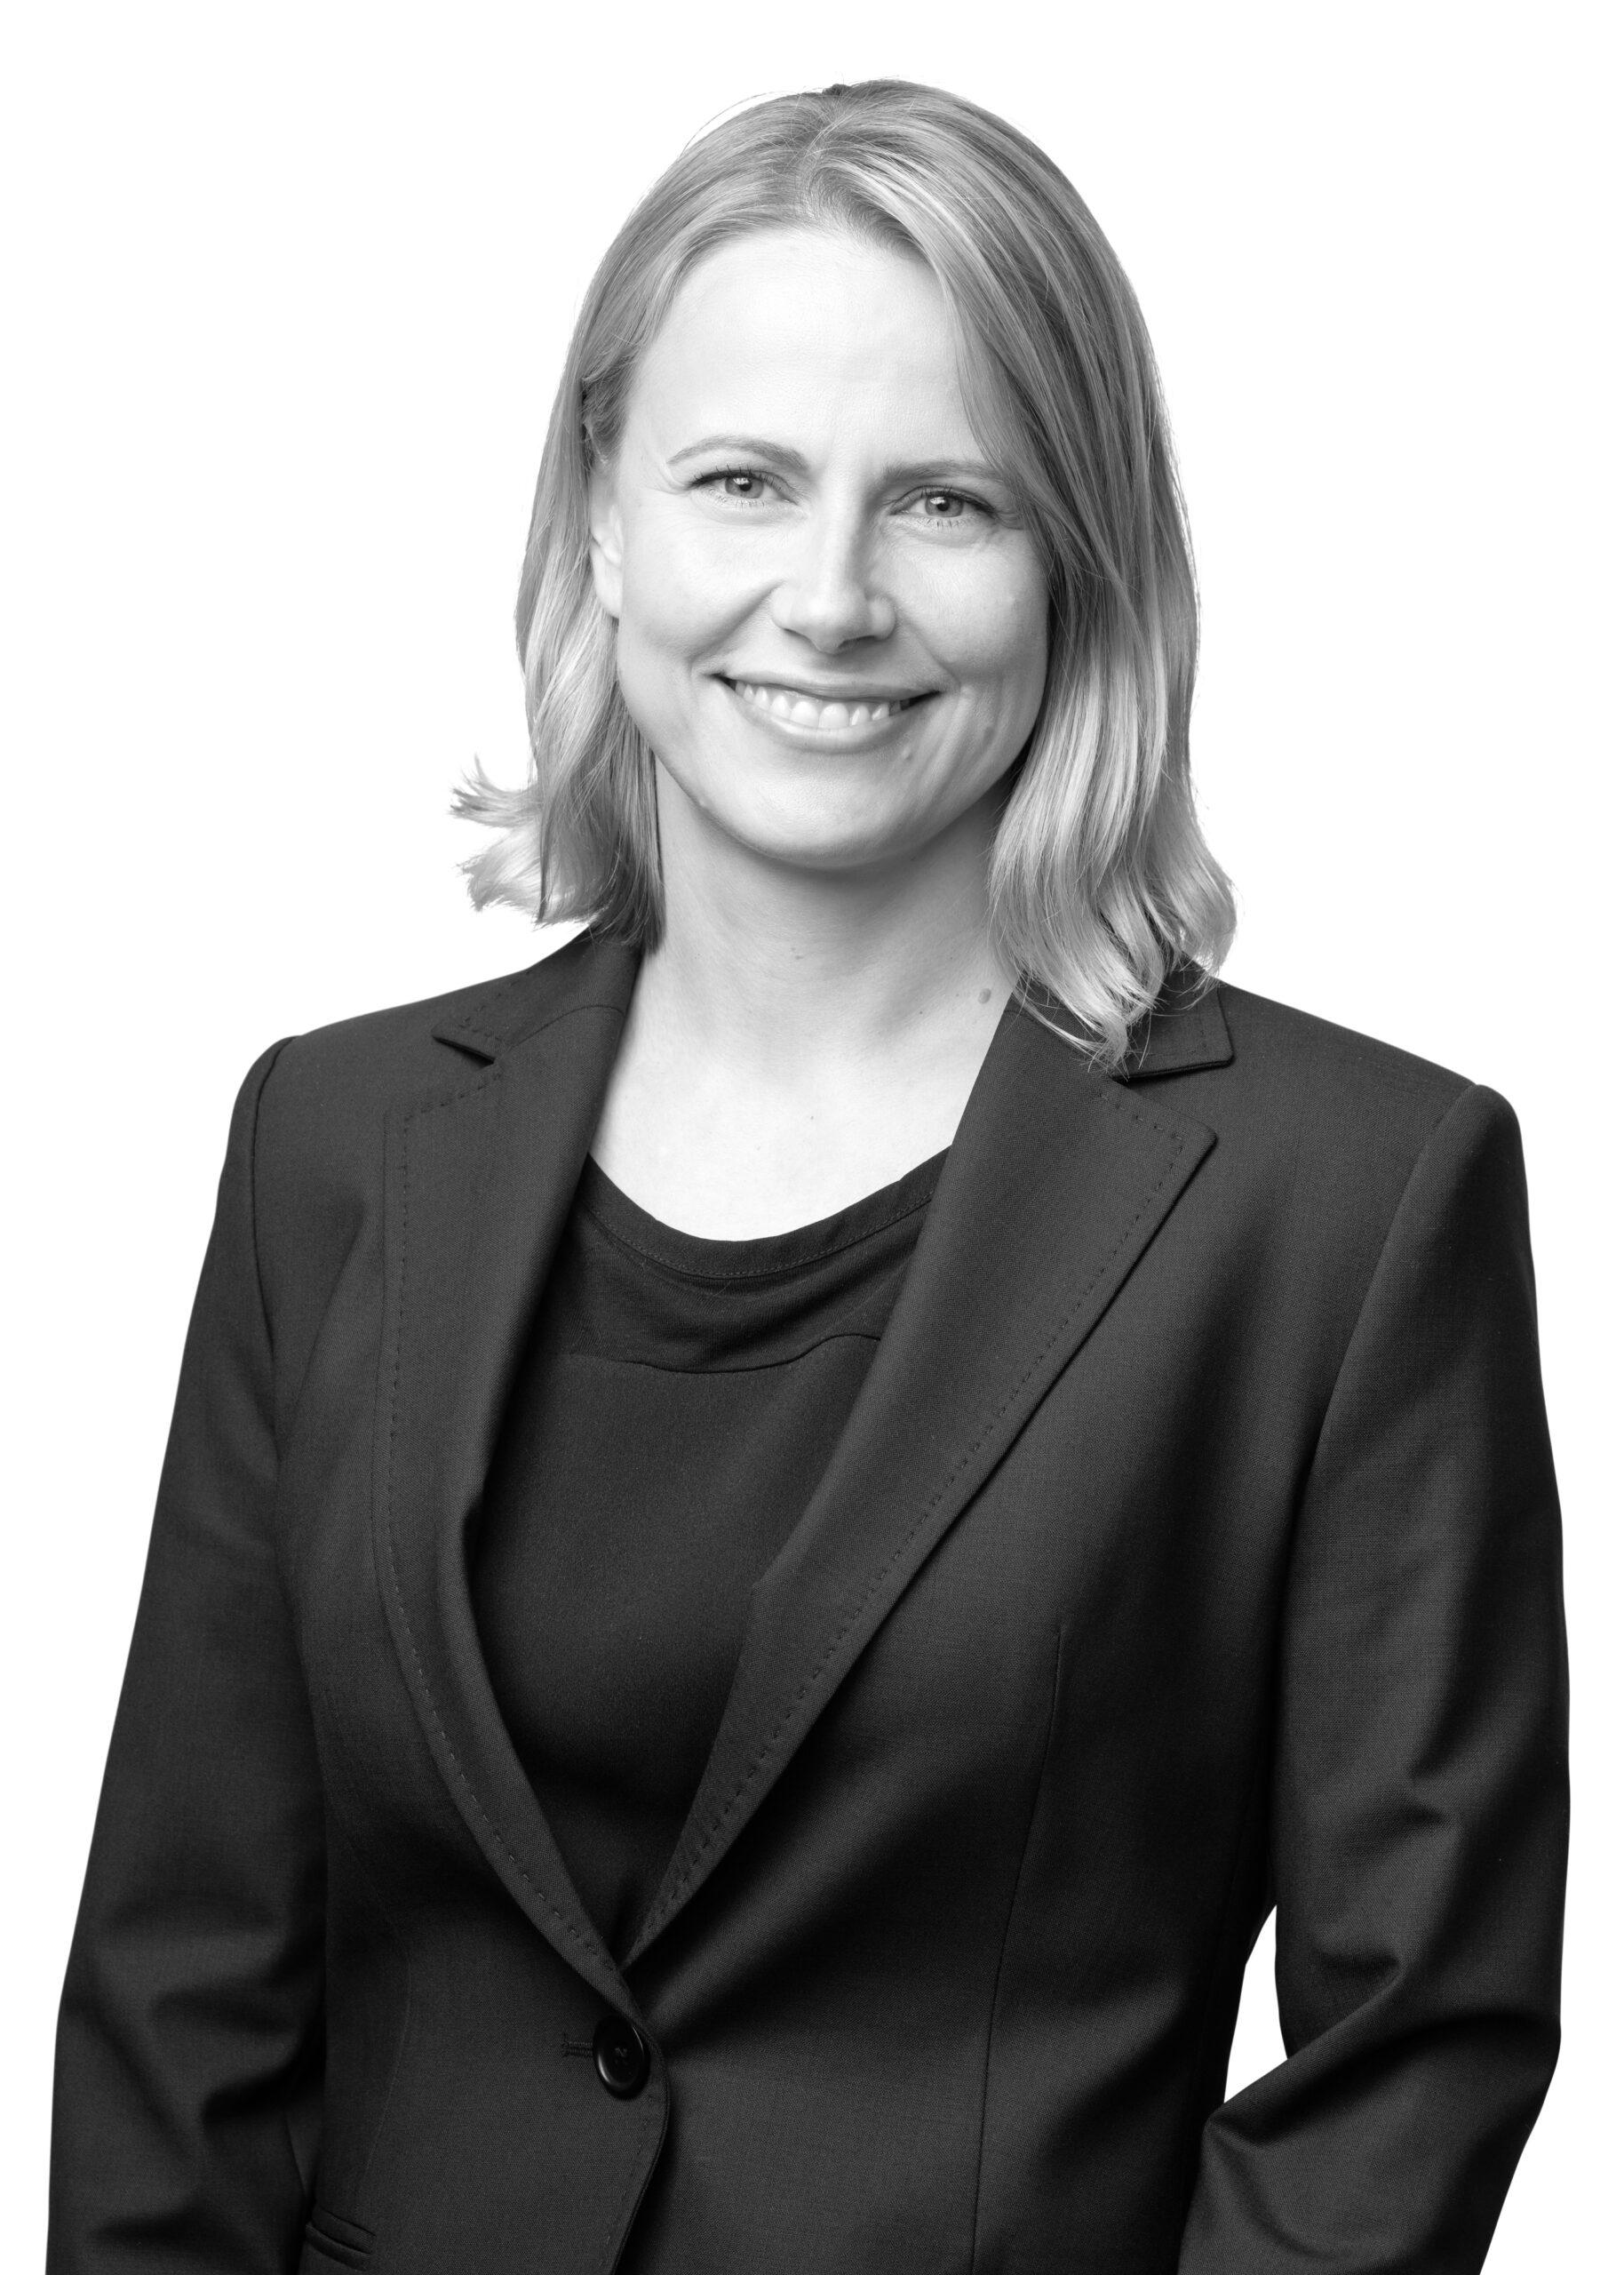 Heidi Untamala